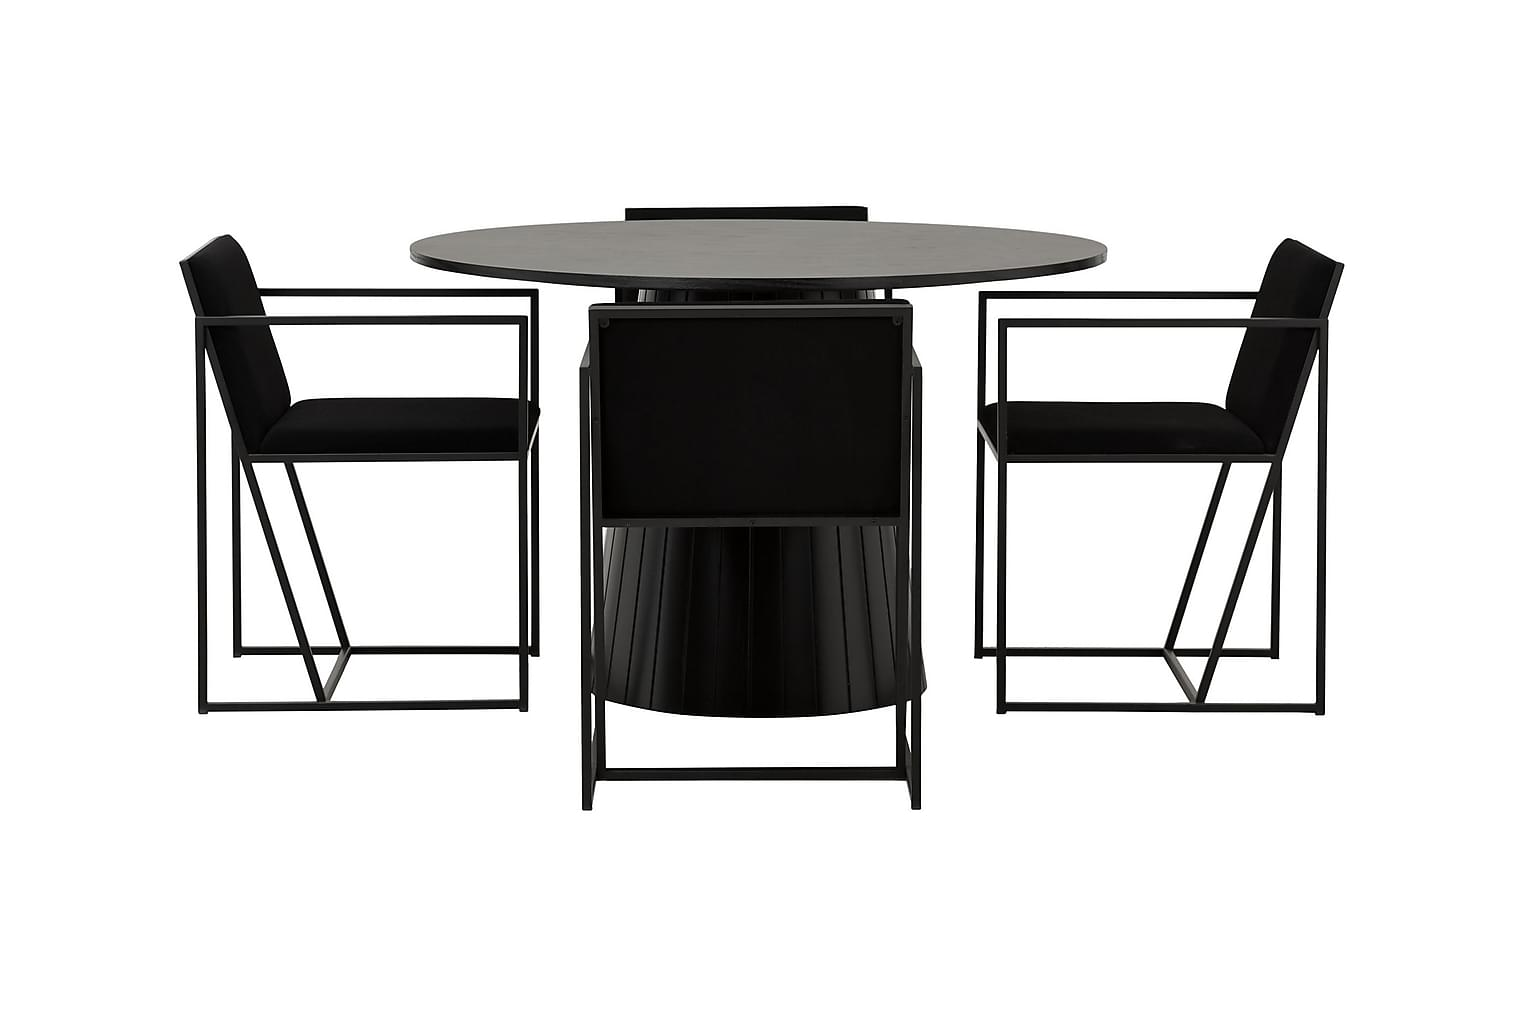 AVIO Pöytä 120 Musta Tammi/Musta +4 JOY 001 Musta